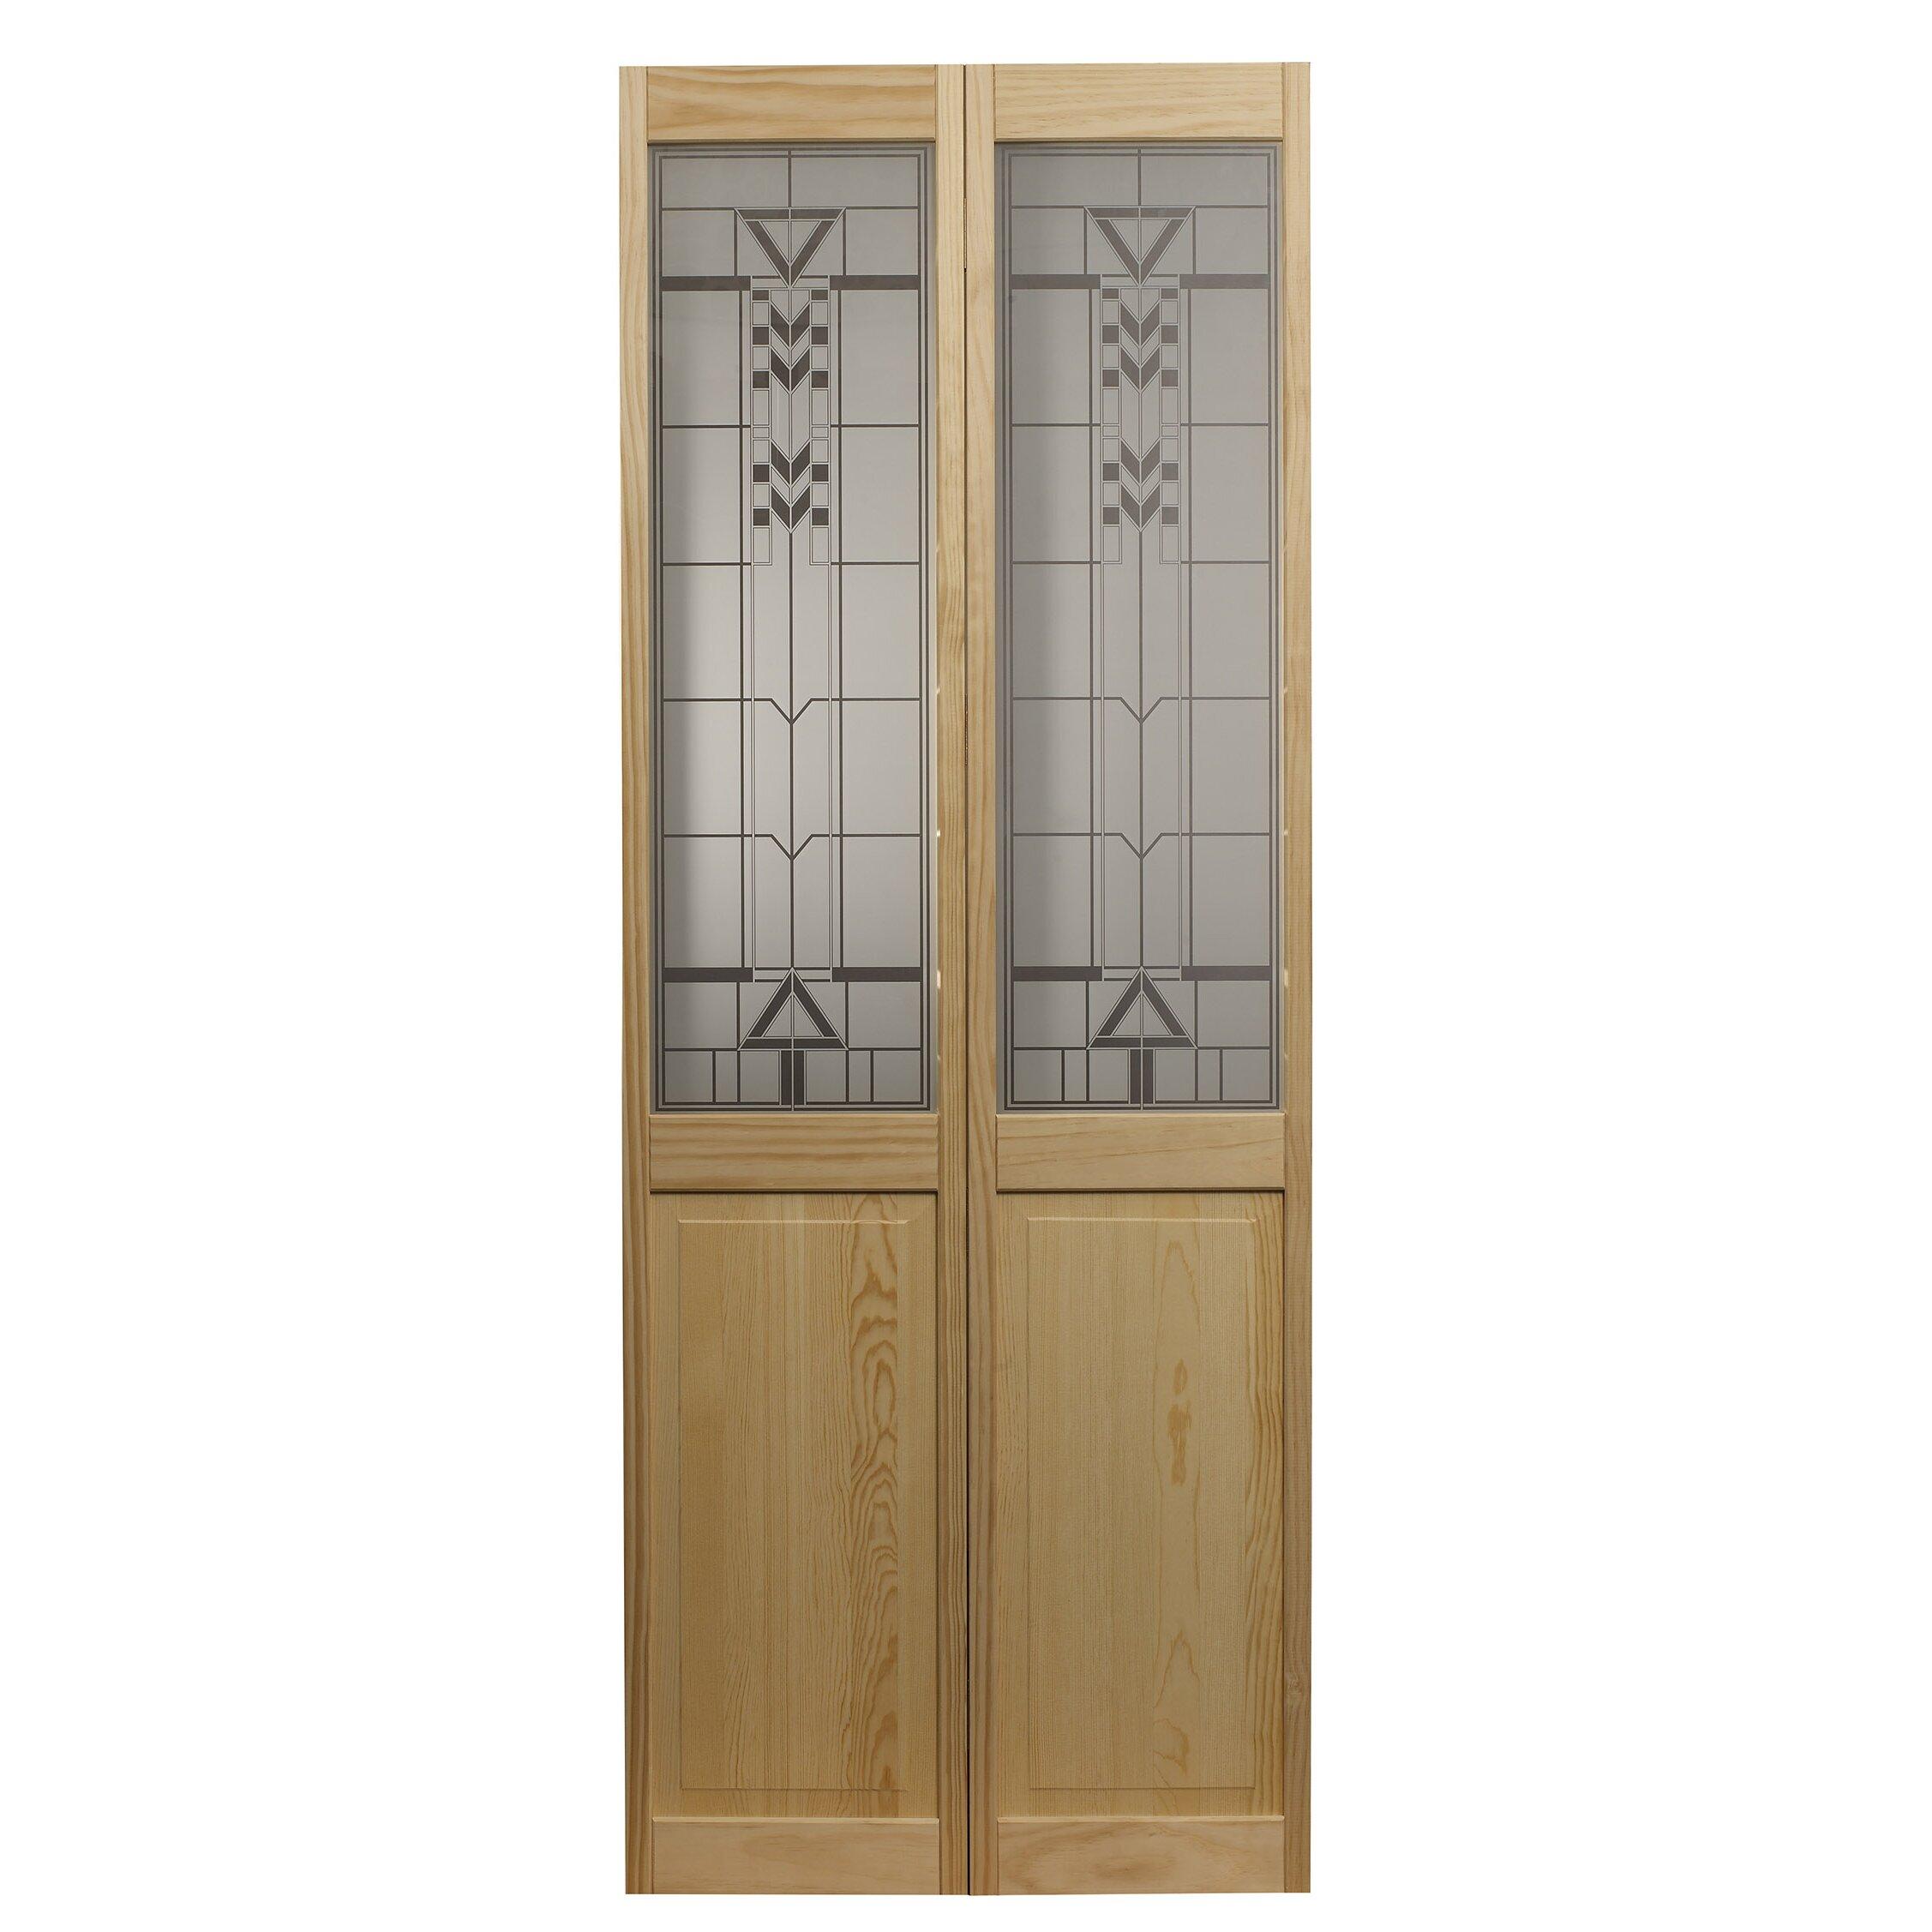 2254 #886C44 LTL Bi Fold Doors Pinecroft Wood Unfinished Bi Fold Interior Door  pic Unfinished Wood Doors 40712254